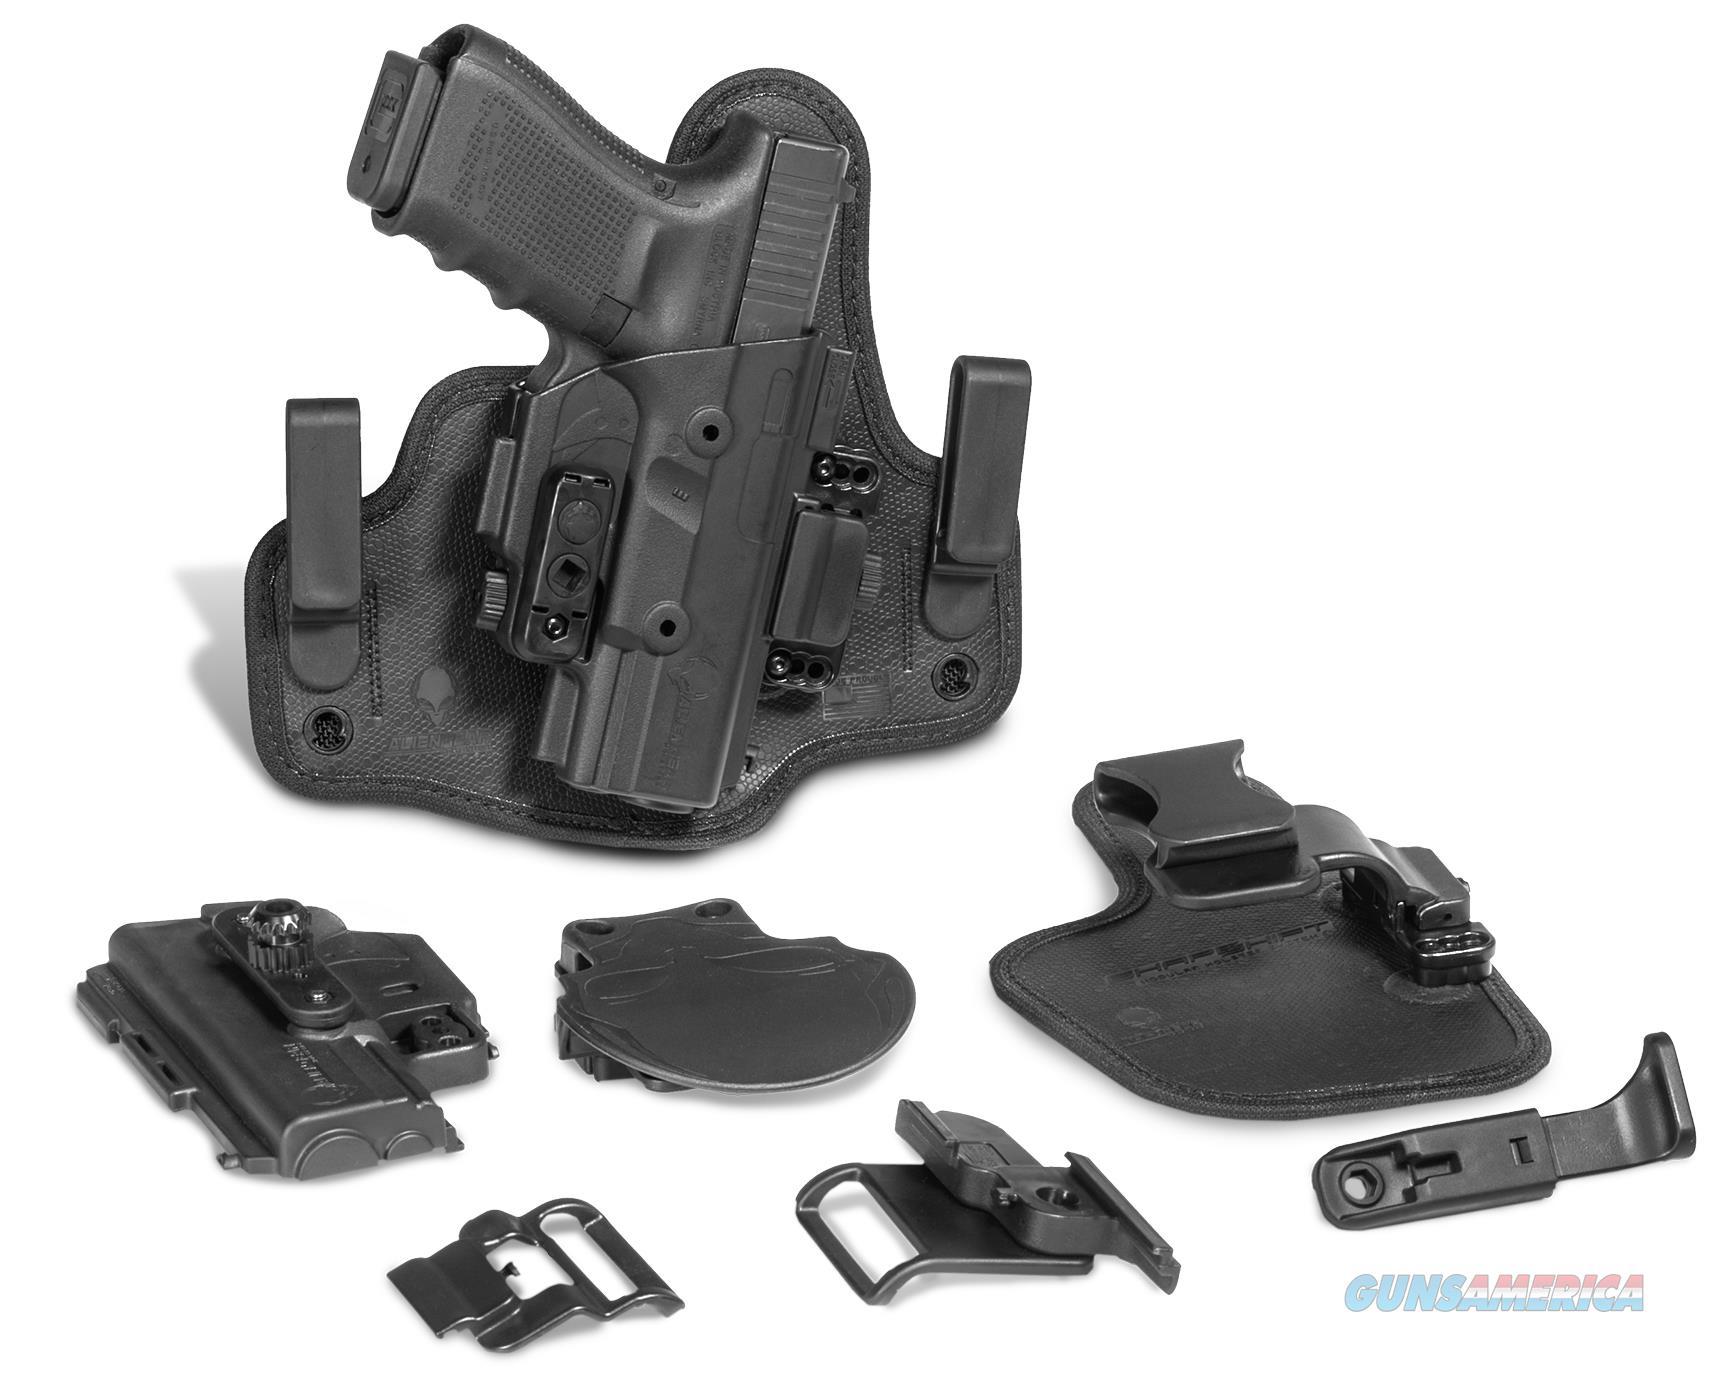 Alien Gear Holsters Shapeshift, Agh Sshk-0194-rh-r-15-xxx Shape Shift Kit Xdm 3.8  Guns > Pistols > 1911 Pistol Copies (non-Colt)